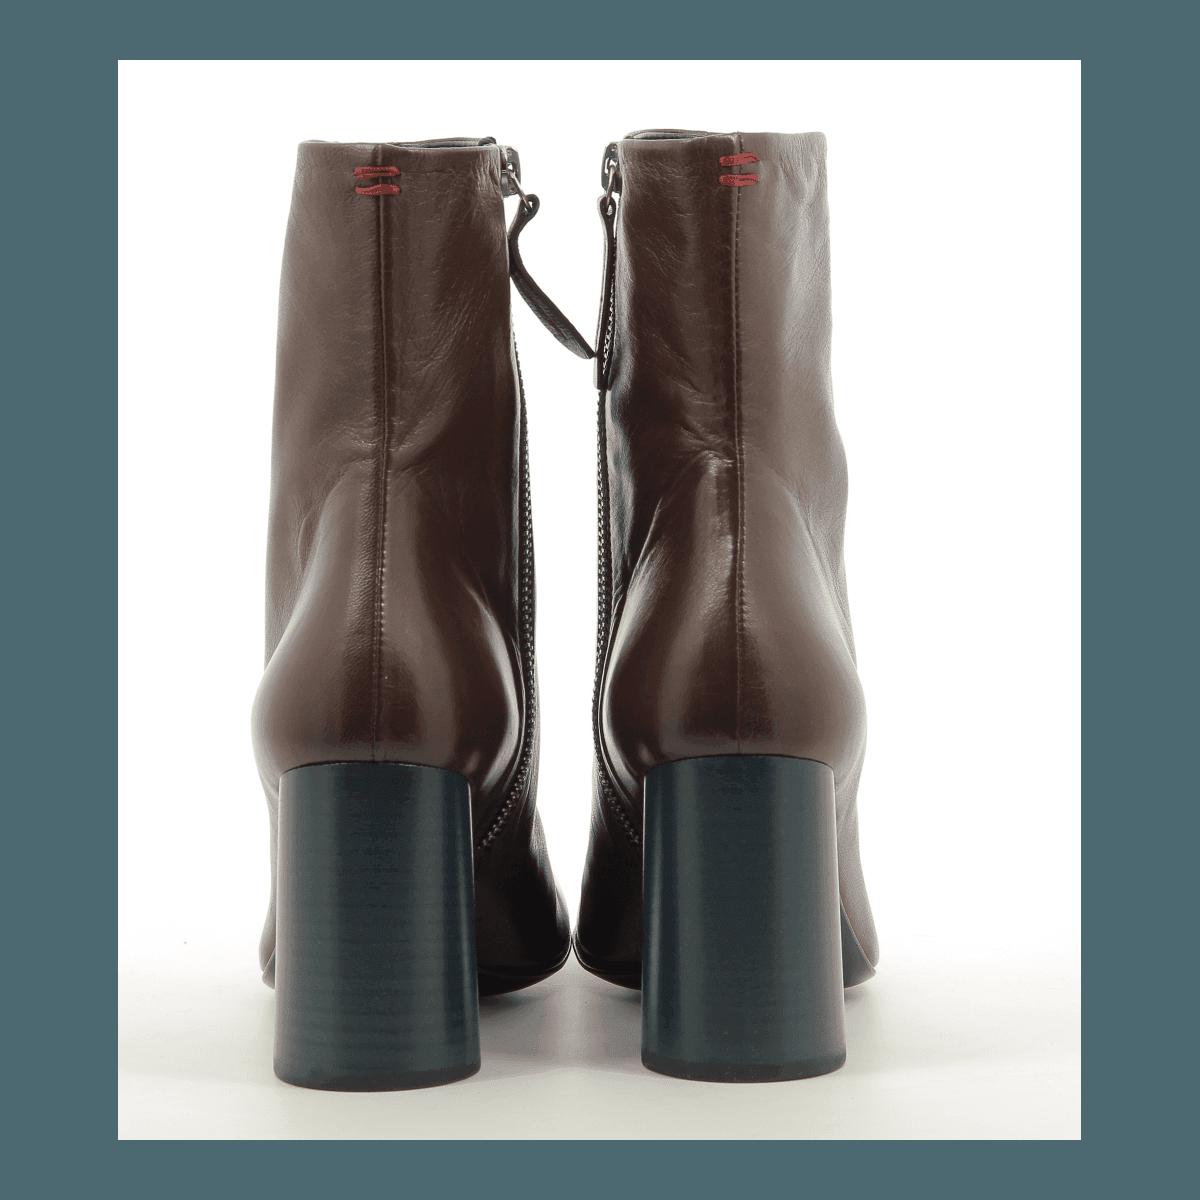 Bottines  en cuir cognac Halmanera - ORIETT02